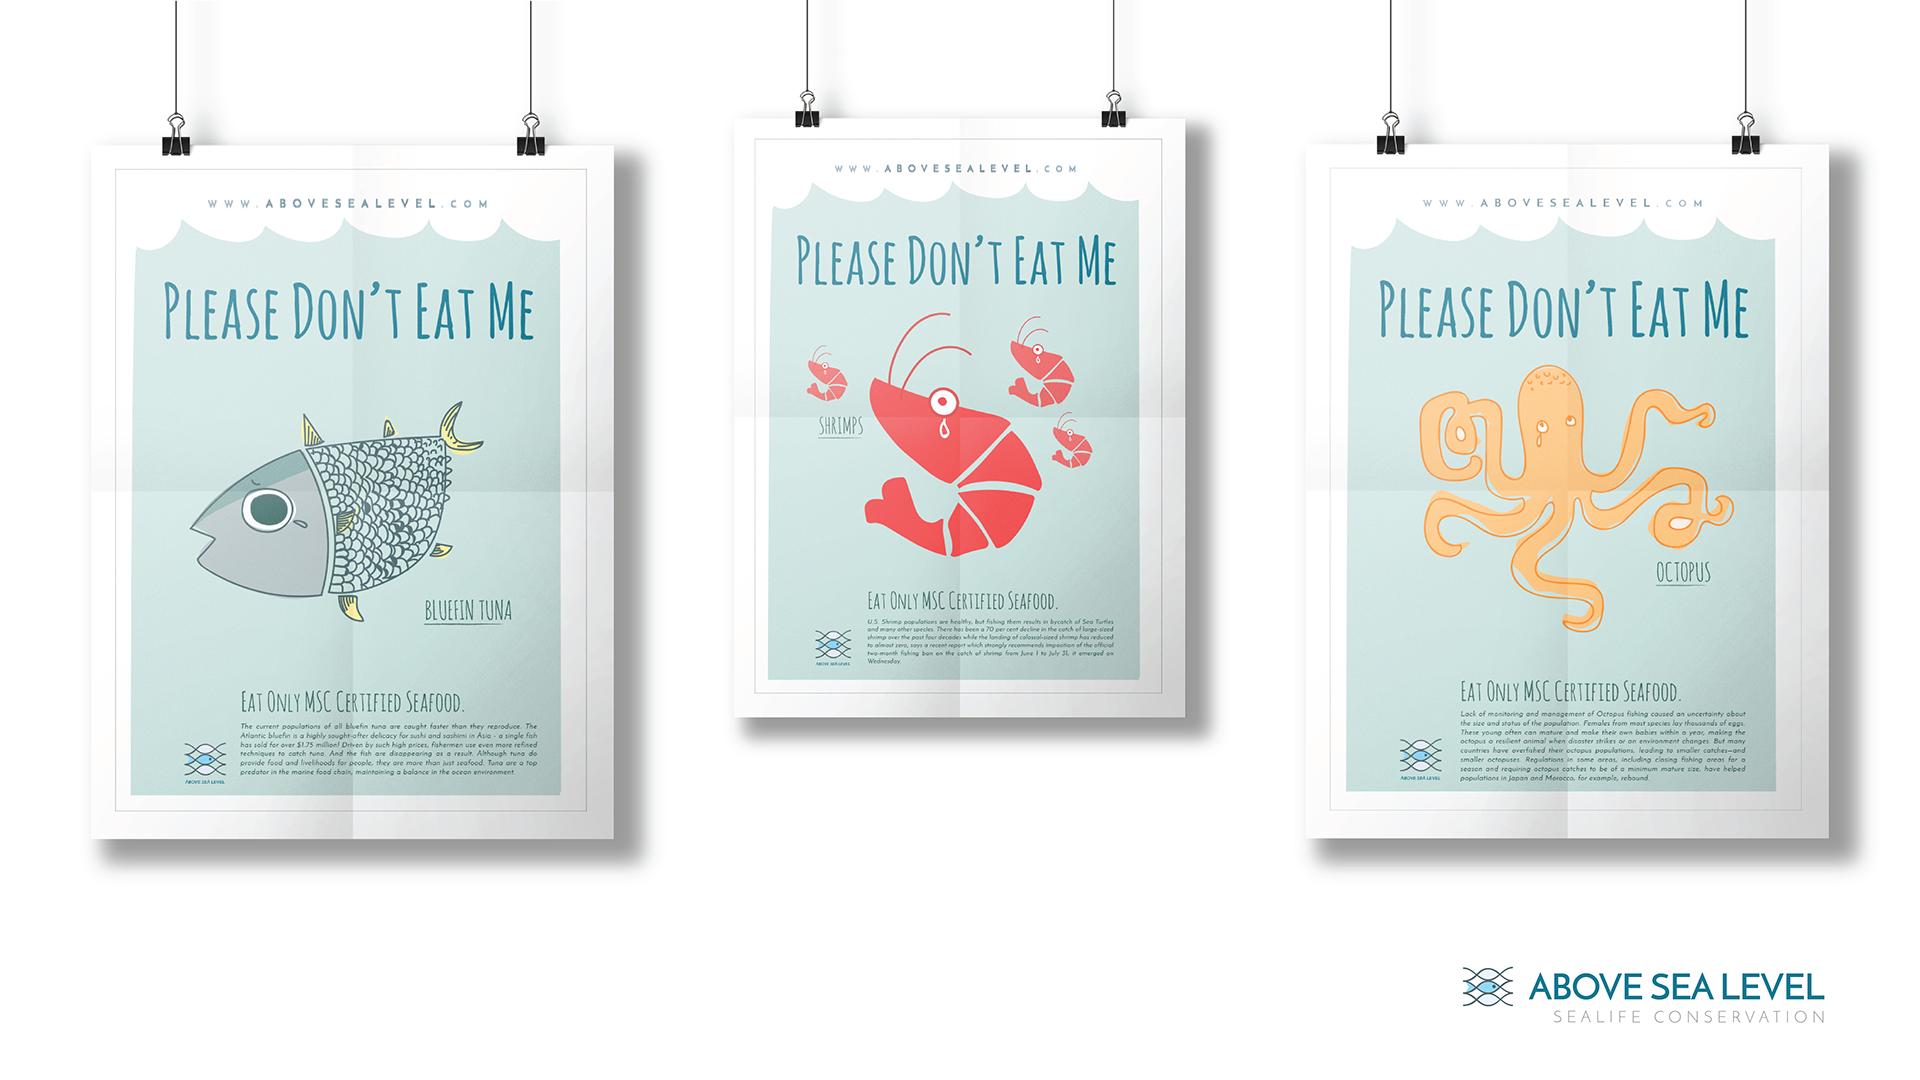 Awareness Campaign | Don't Eat Me Sealife Wins Vega Digital Awards